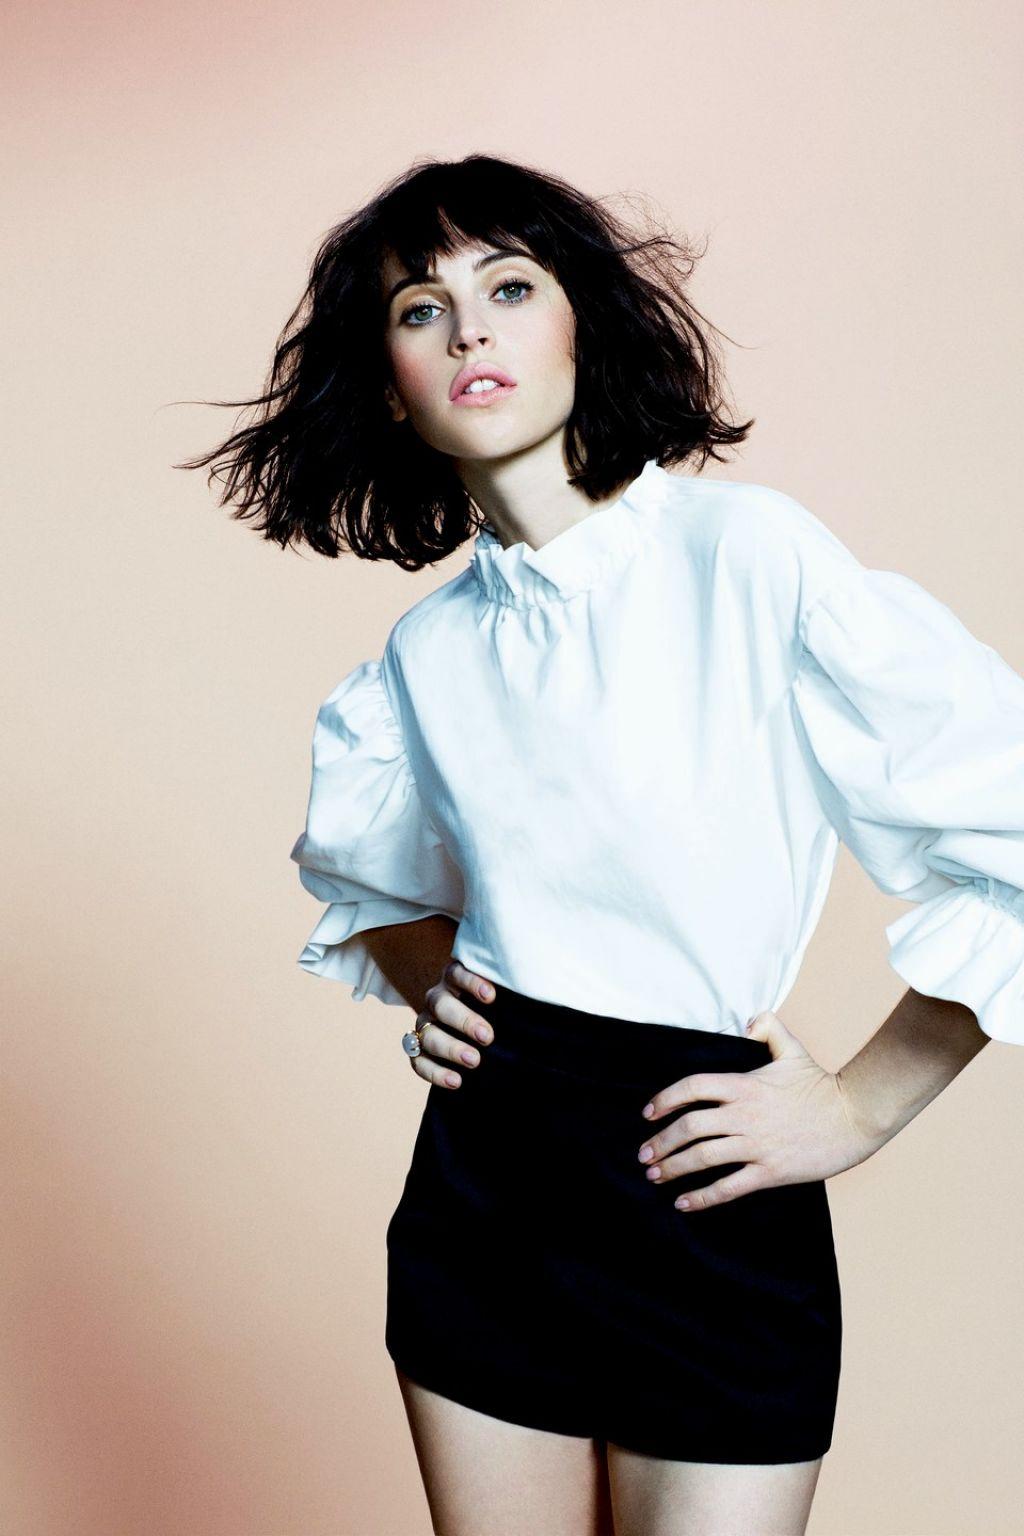 Felicity Jones - Photoshoot for You Magazine - February